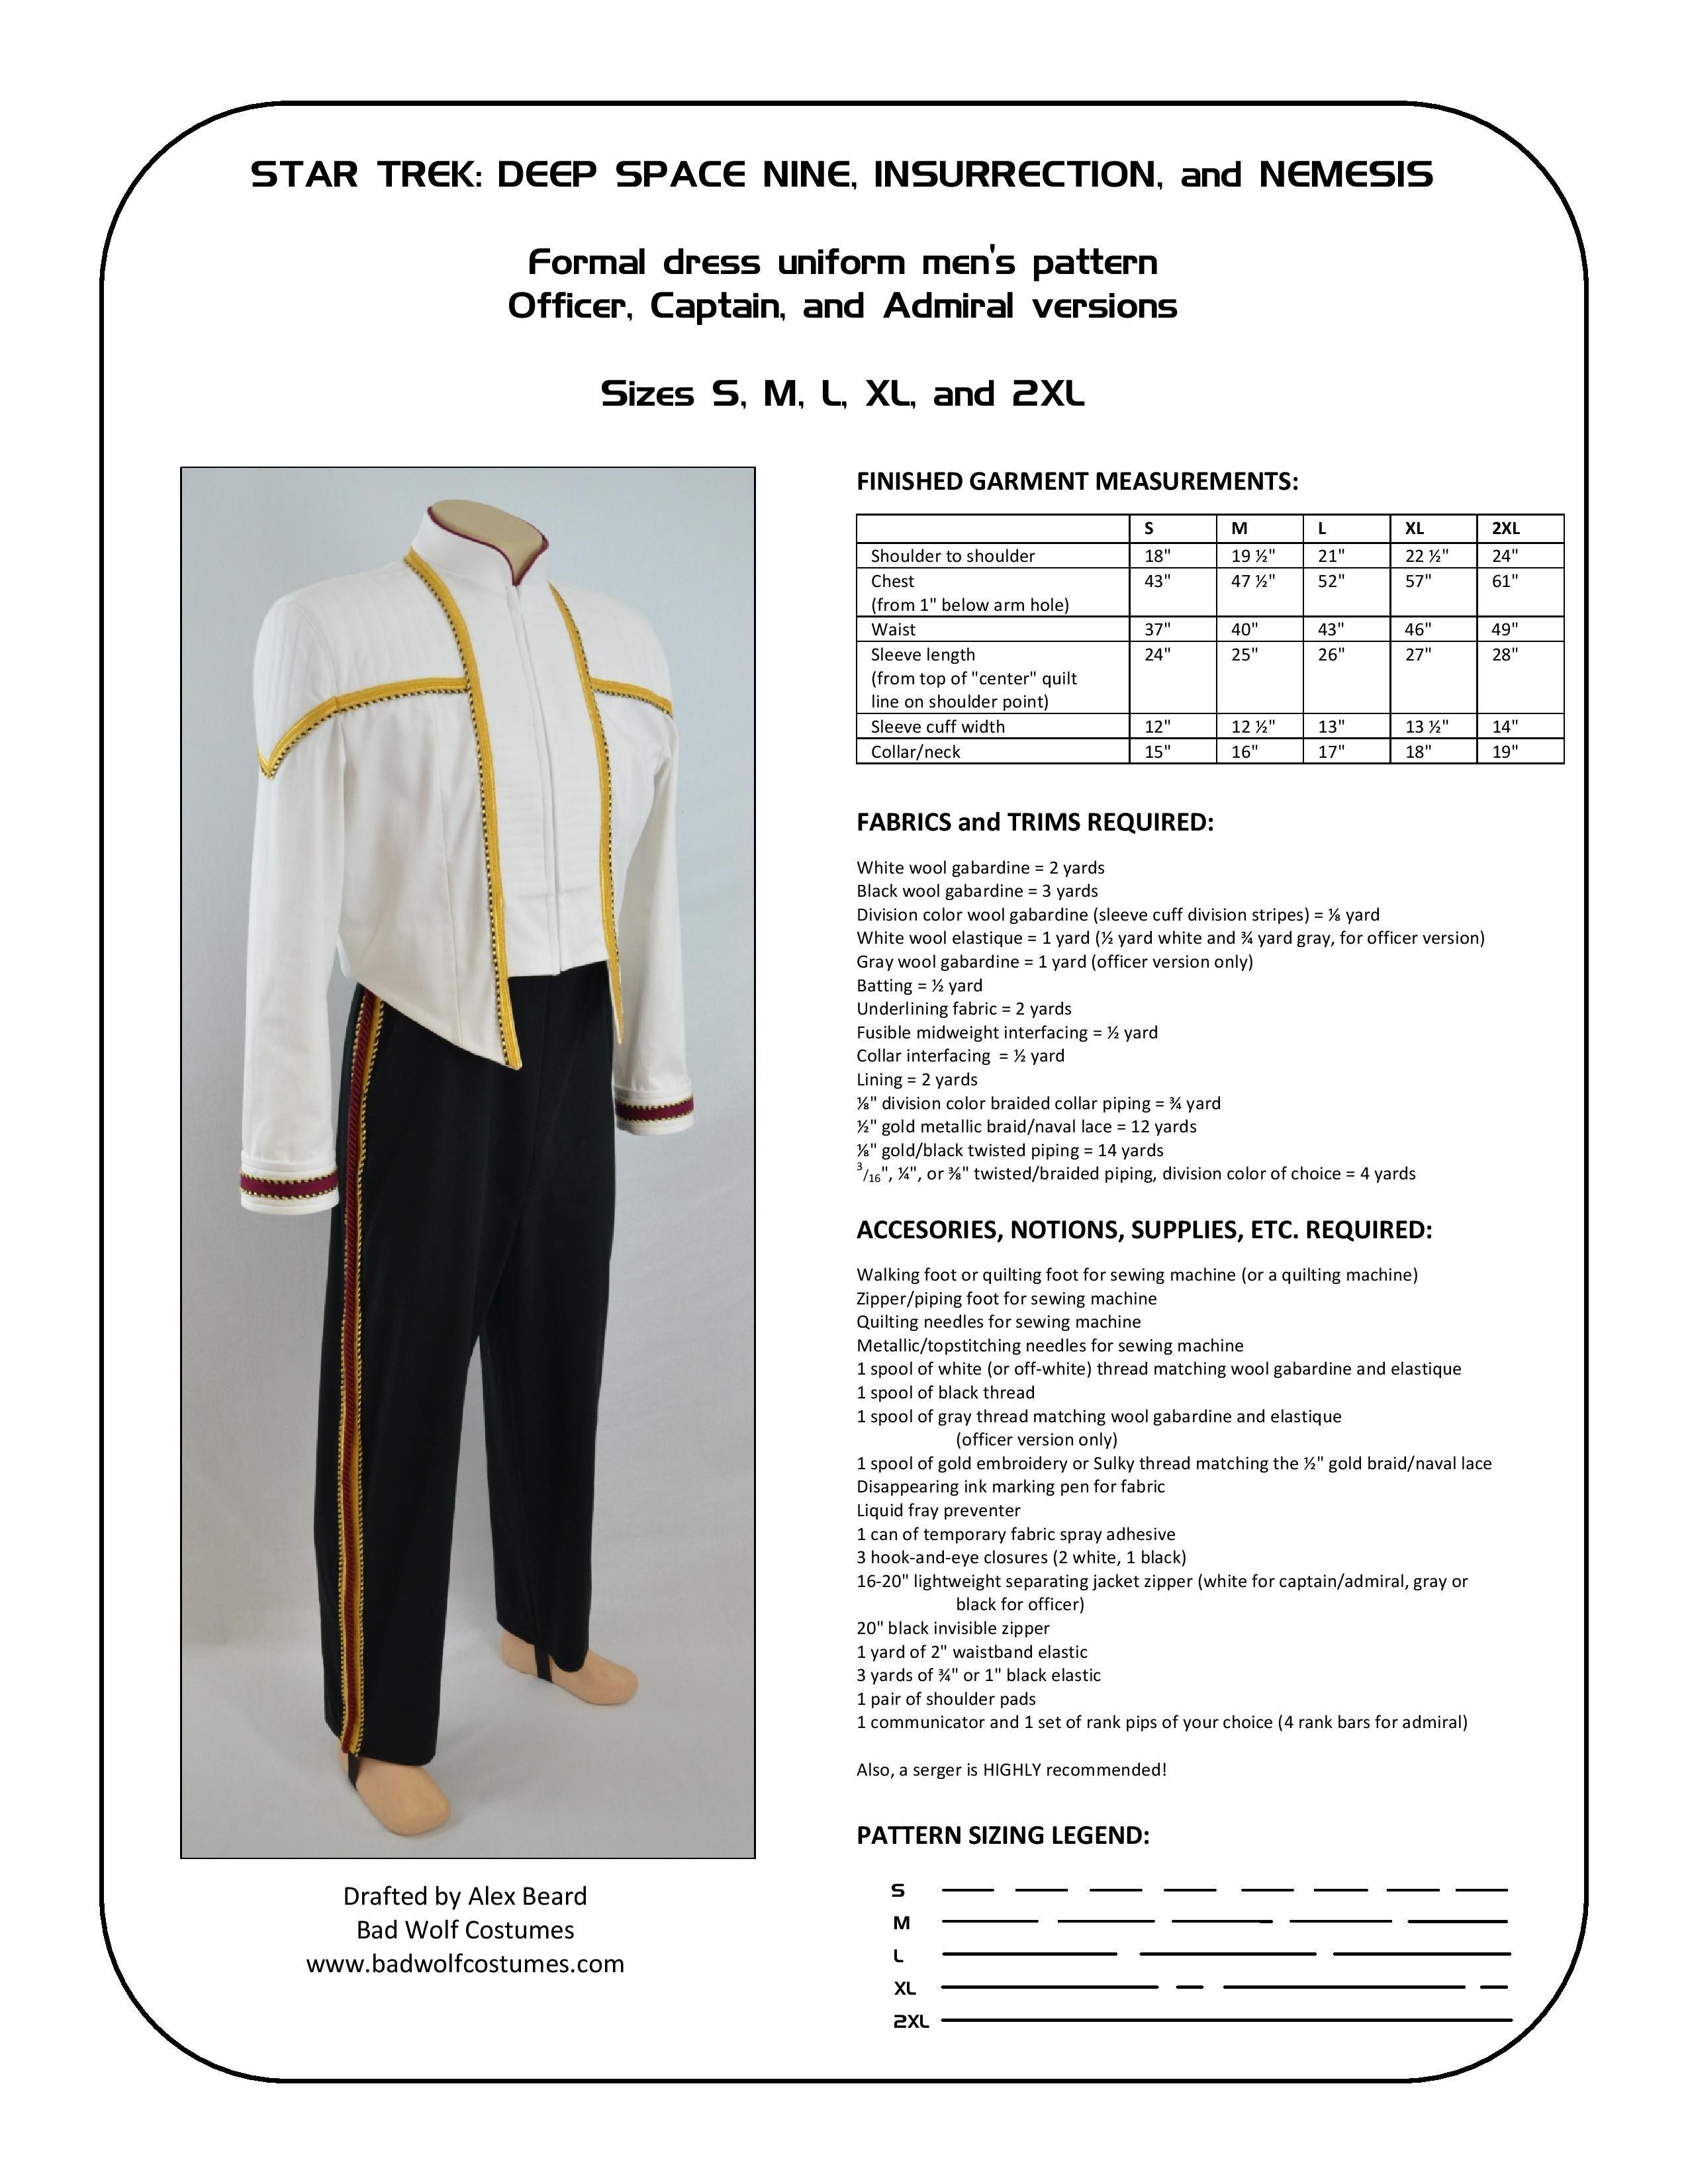 Star Trek: DS9/NEM Men\'s Formal Uniform Sewing Pattern   Star Trek ...